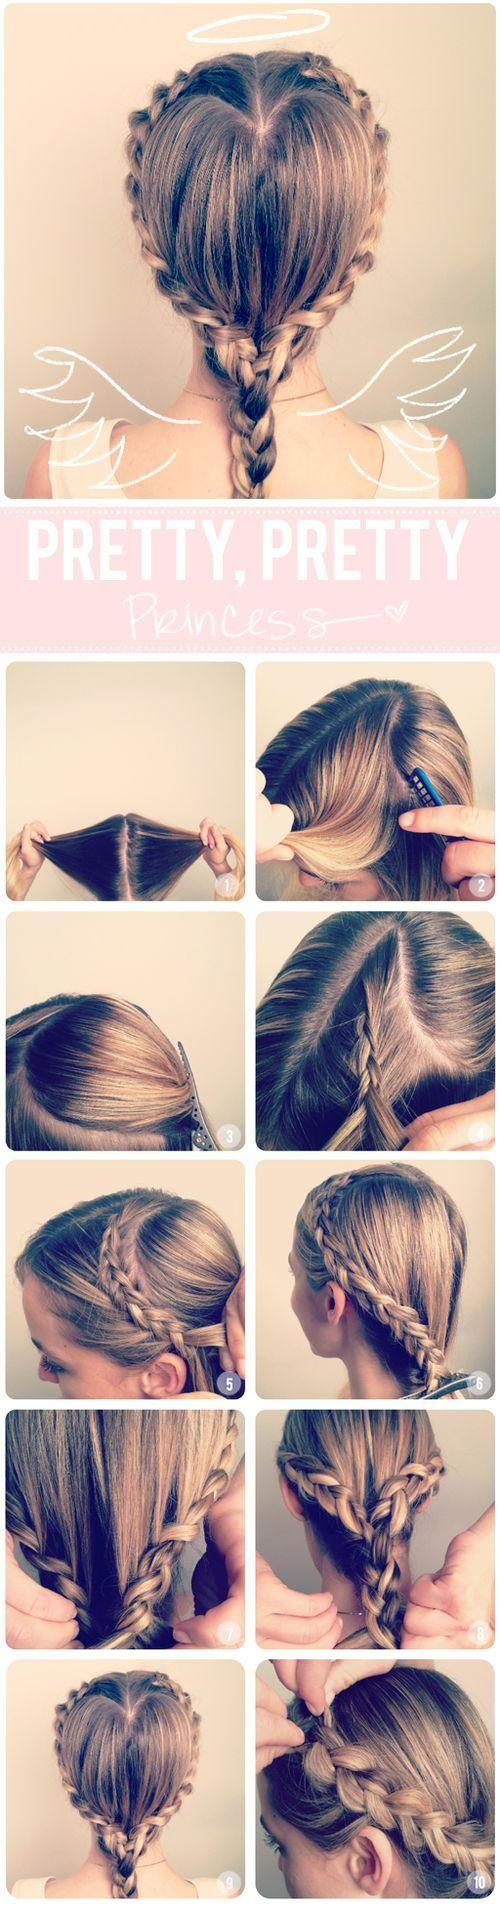 ~ DIY Heart Braid Hairstyle ~